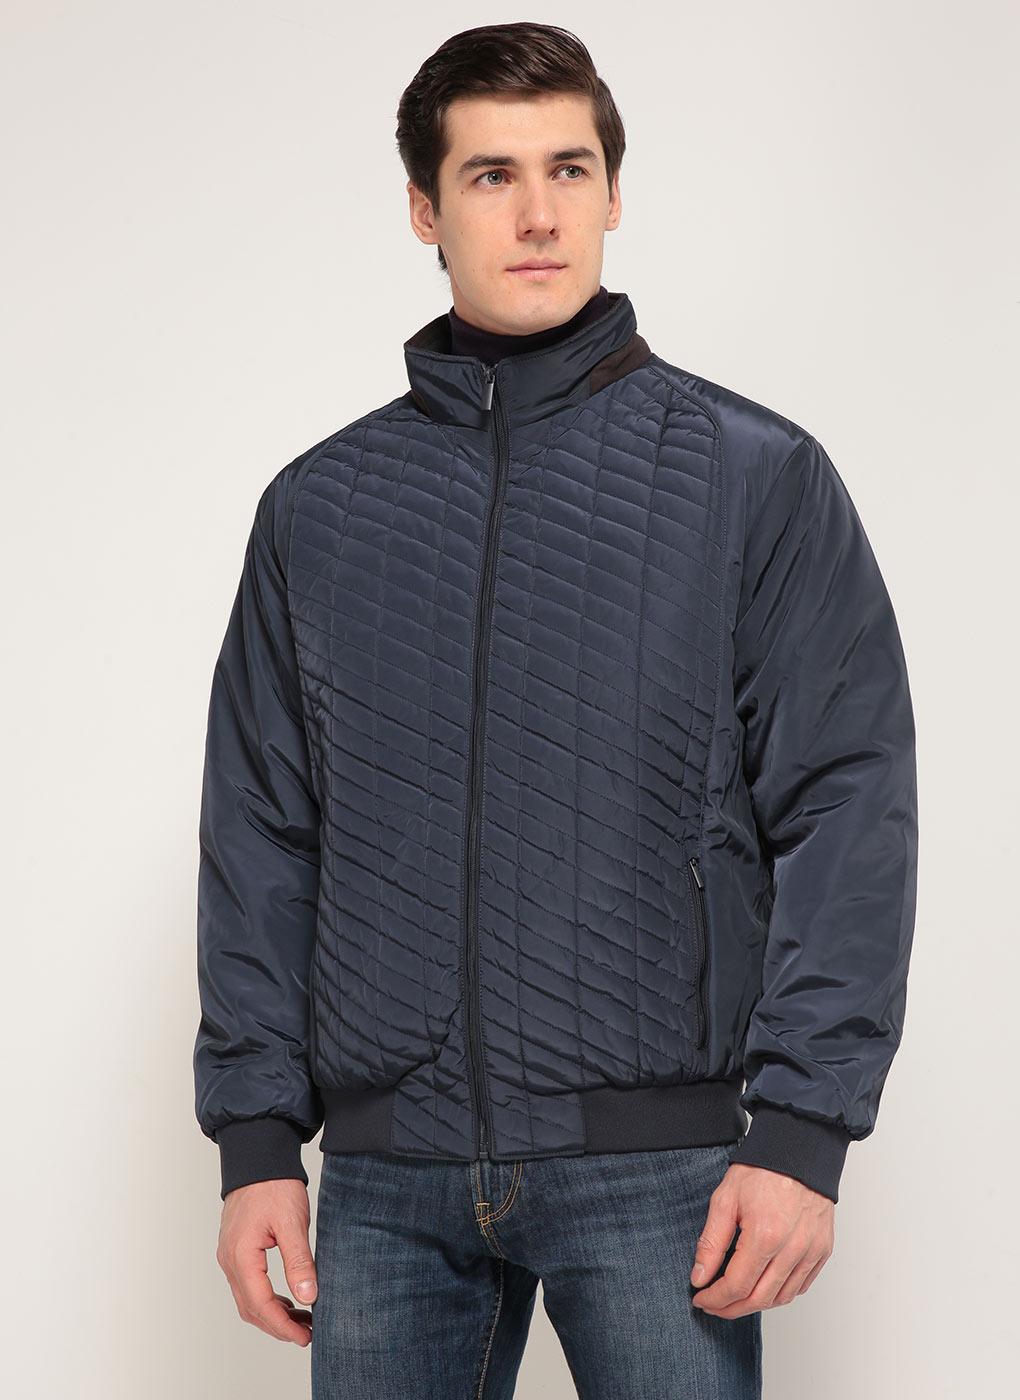 Куртка мужская утепленная 09, Milton фото